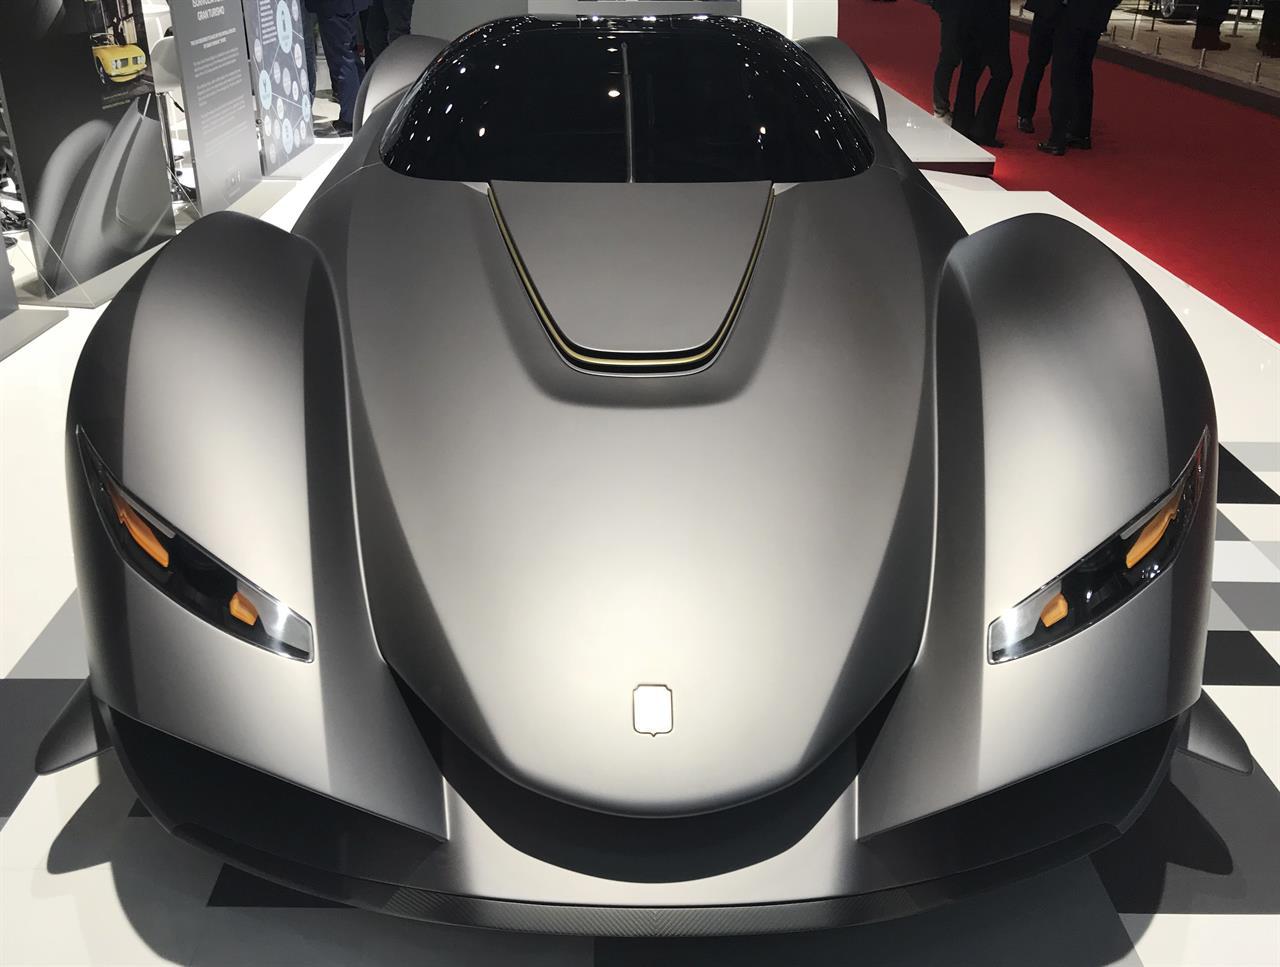 Highend Sports Cars Gleam At Geneva Auto Show Bring Money - 2018 car show dc